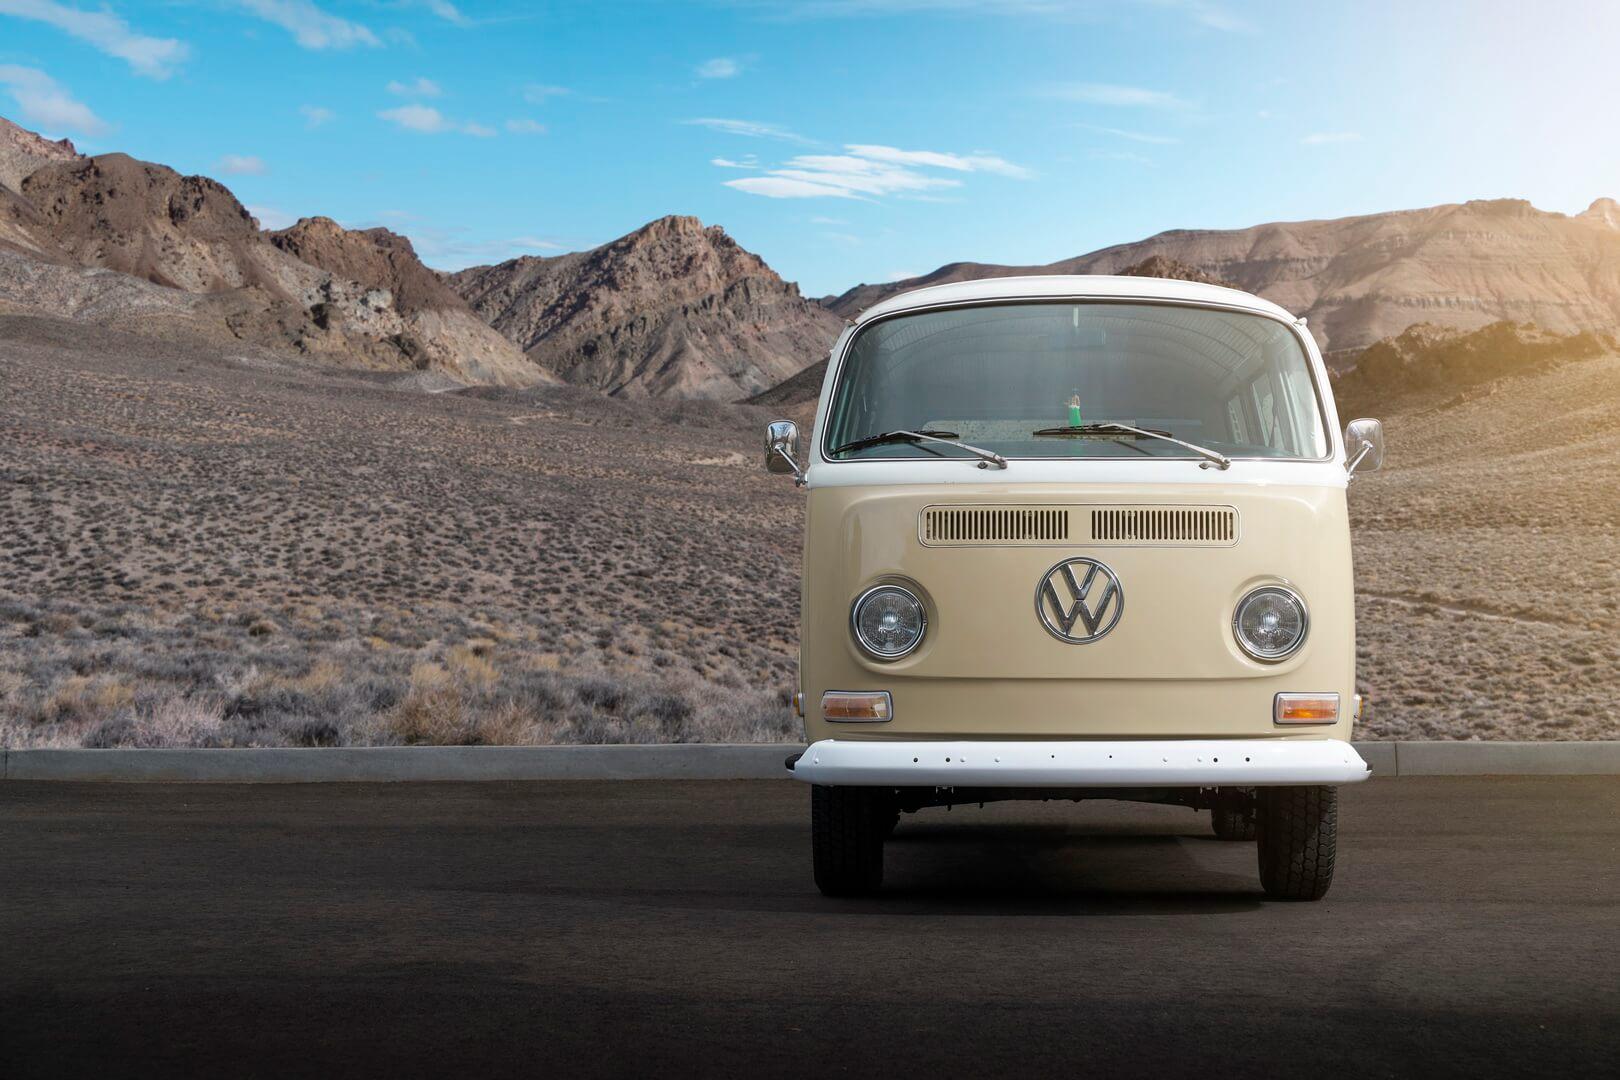 Volkswagen Type2 Bulli превратили в электромобиль